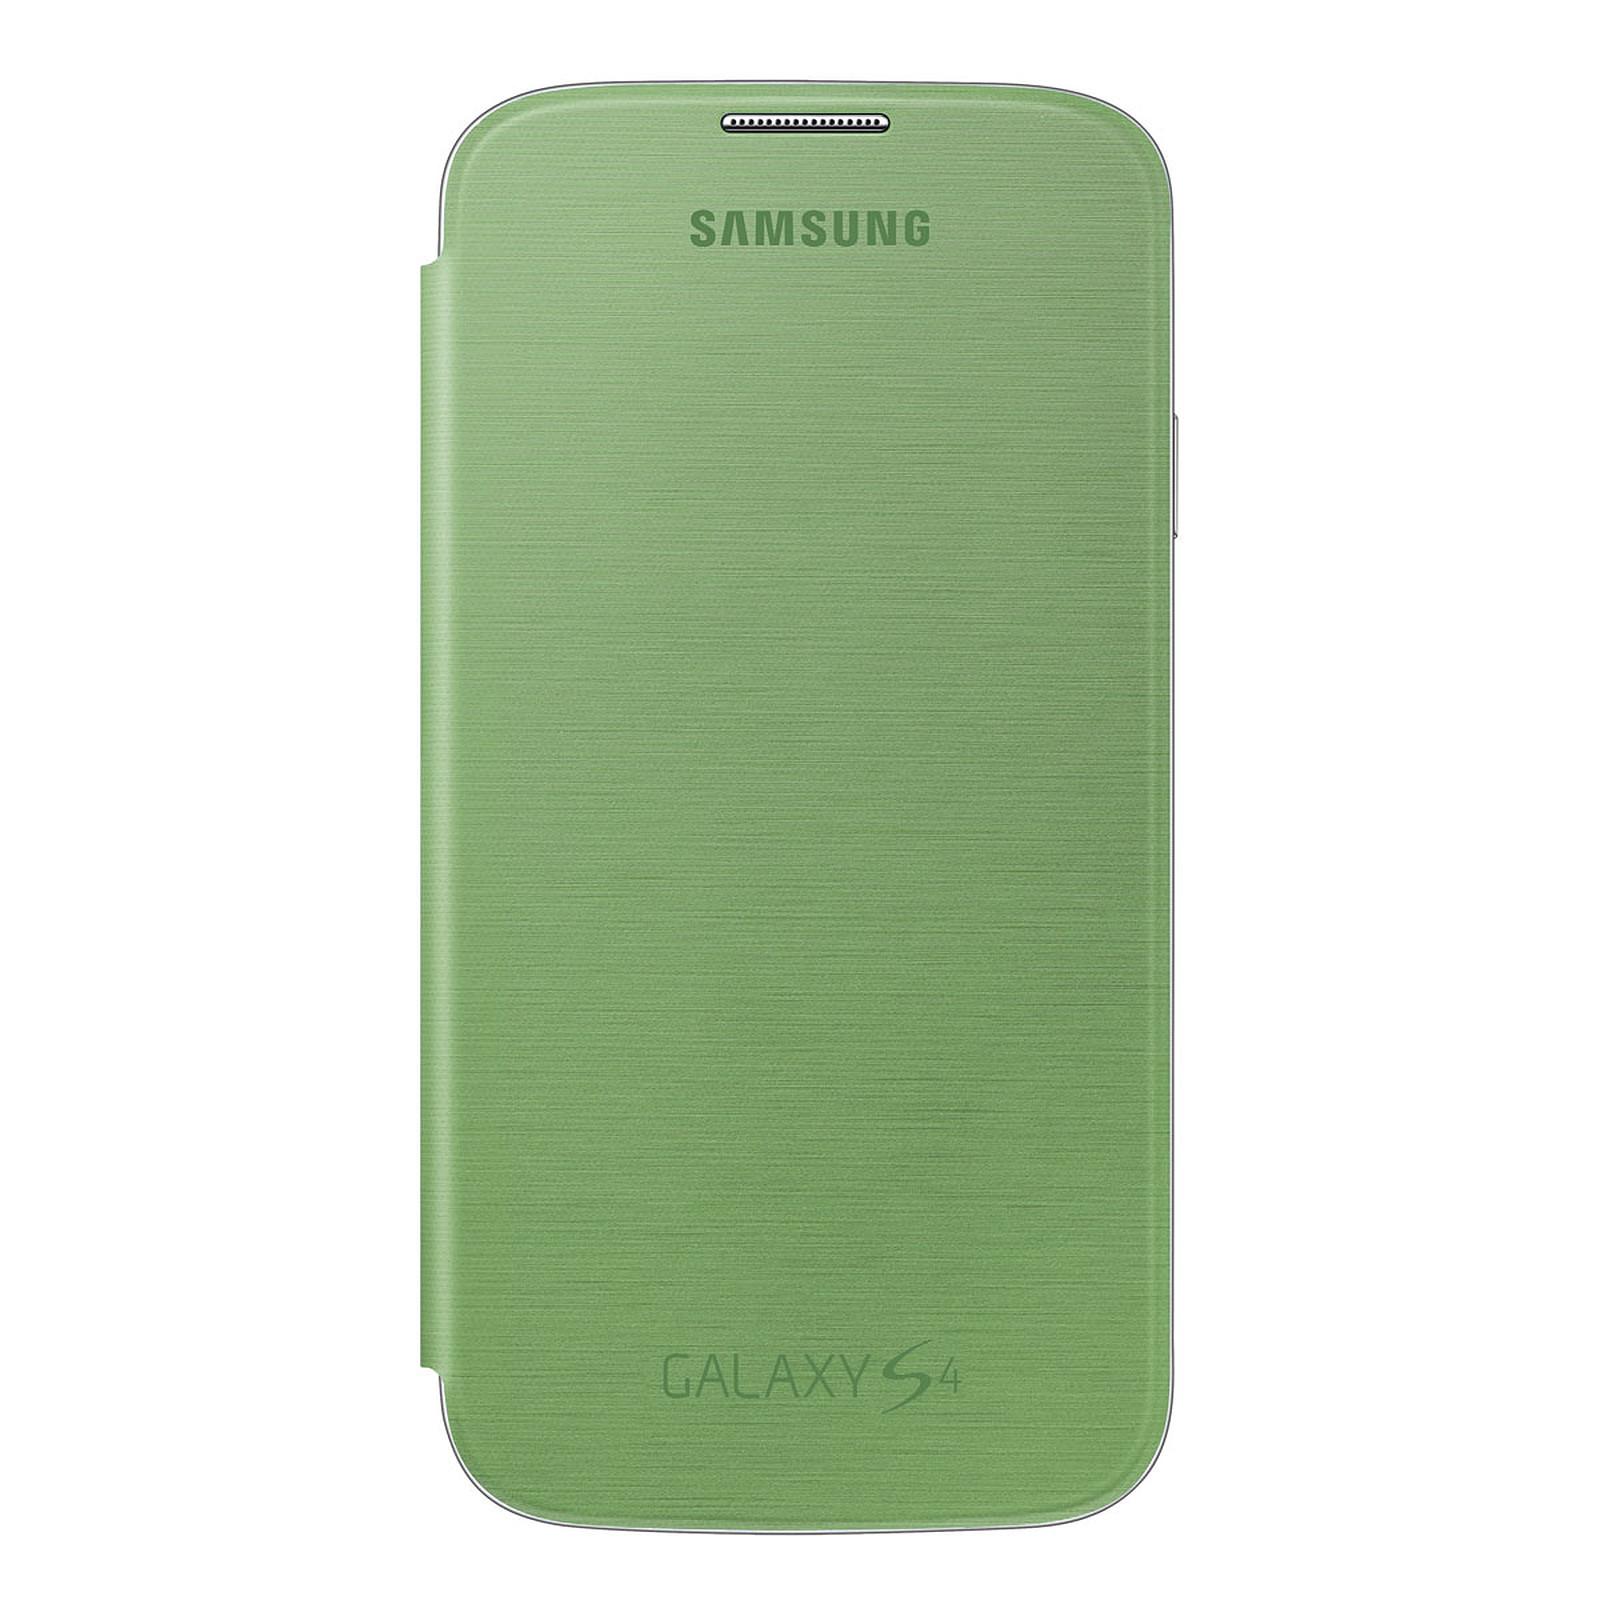 Samsung EF-FI950V - Etui Flip Cover Vert pour Galaxy S4